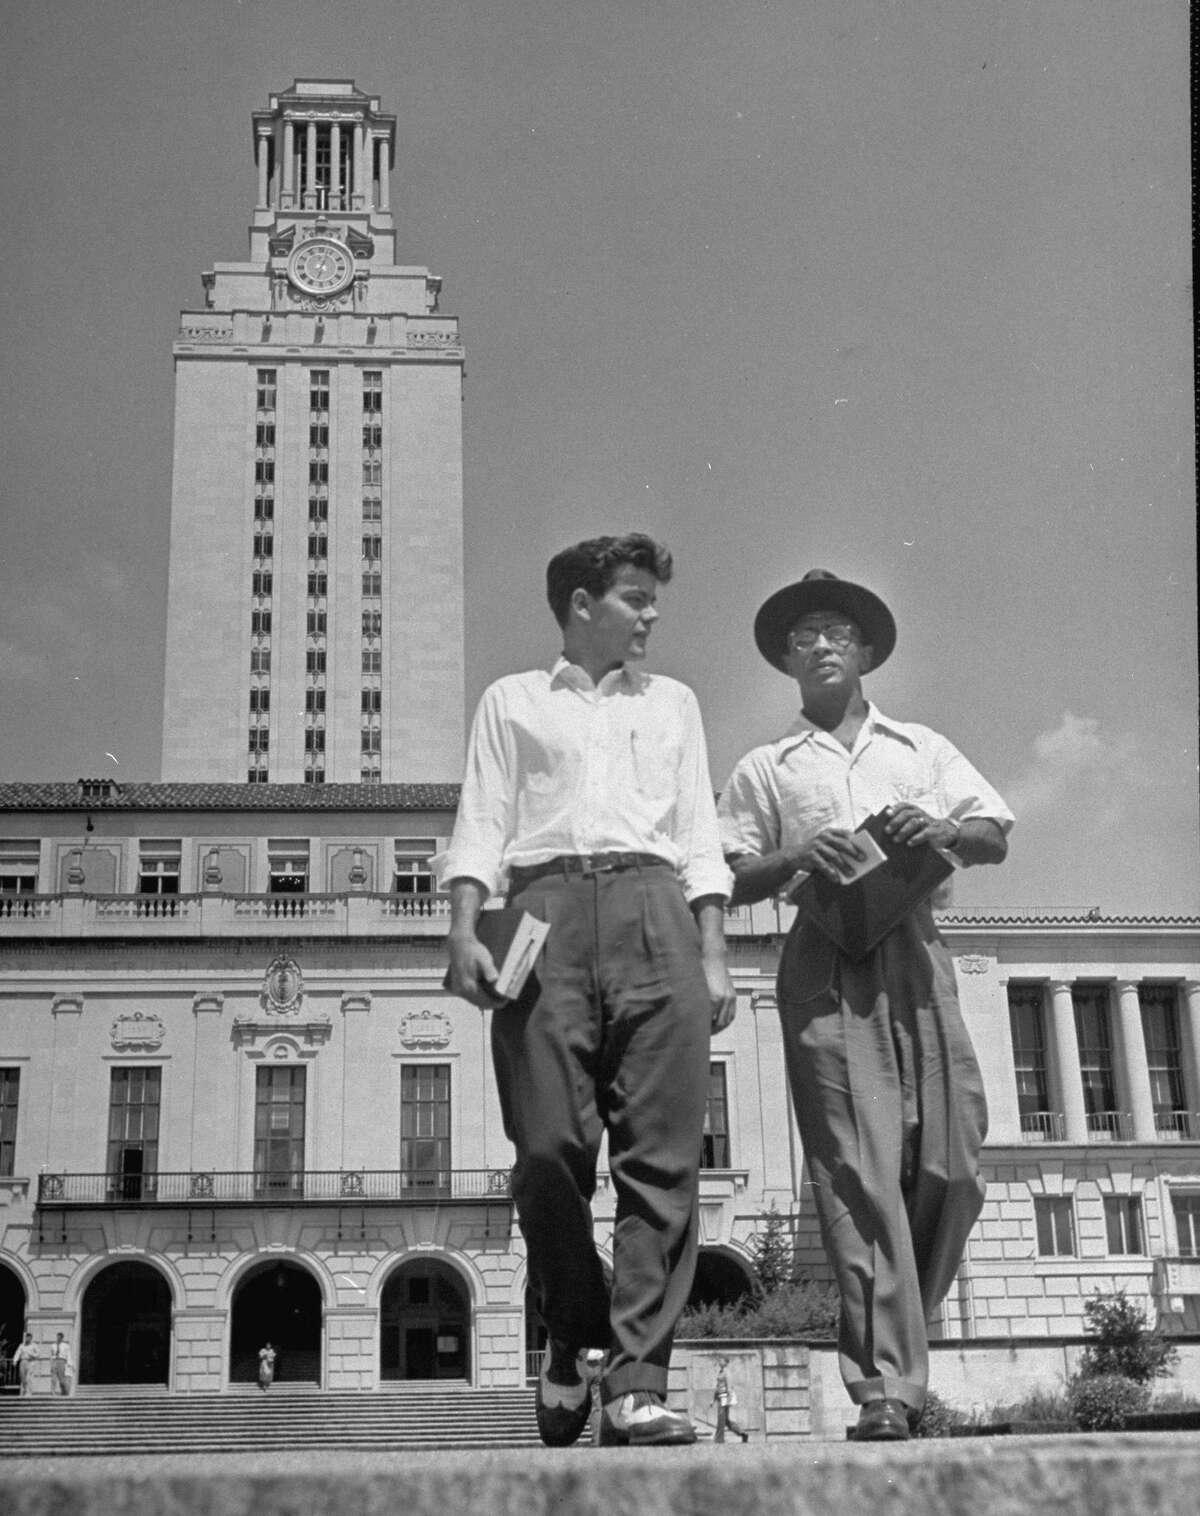 September 1950: (L-R) Campus editor Ronnie Dugger & Heman Marion Sweatt, after his first law class at Texas Univ.